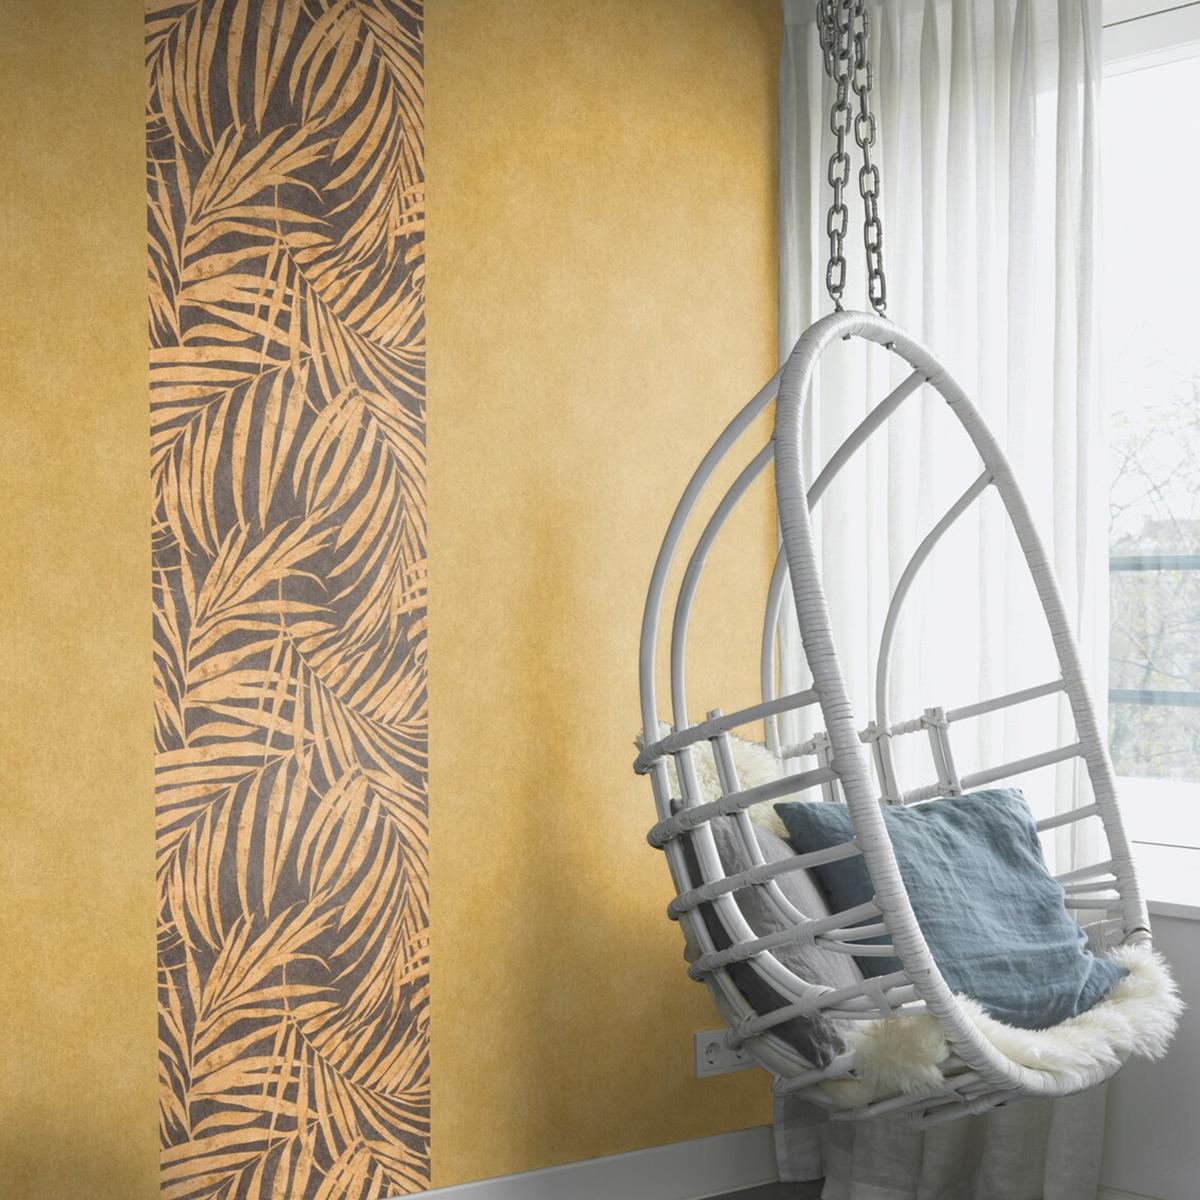 Тапет Инспирейшън 2 жълти палмови клонки кафяво